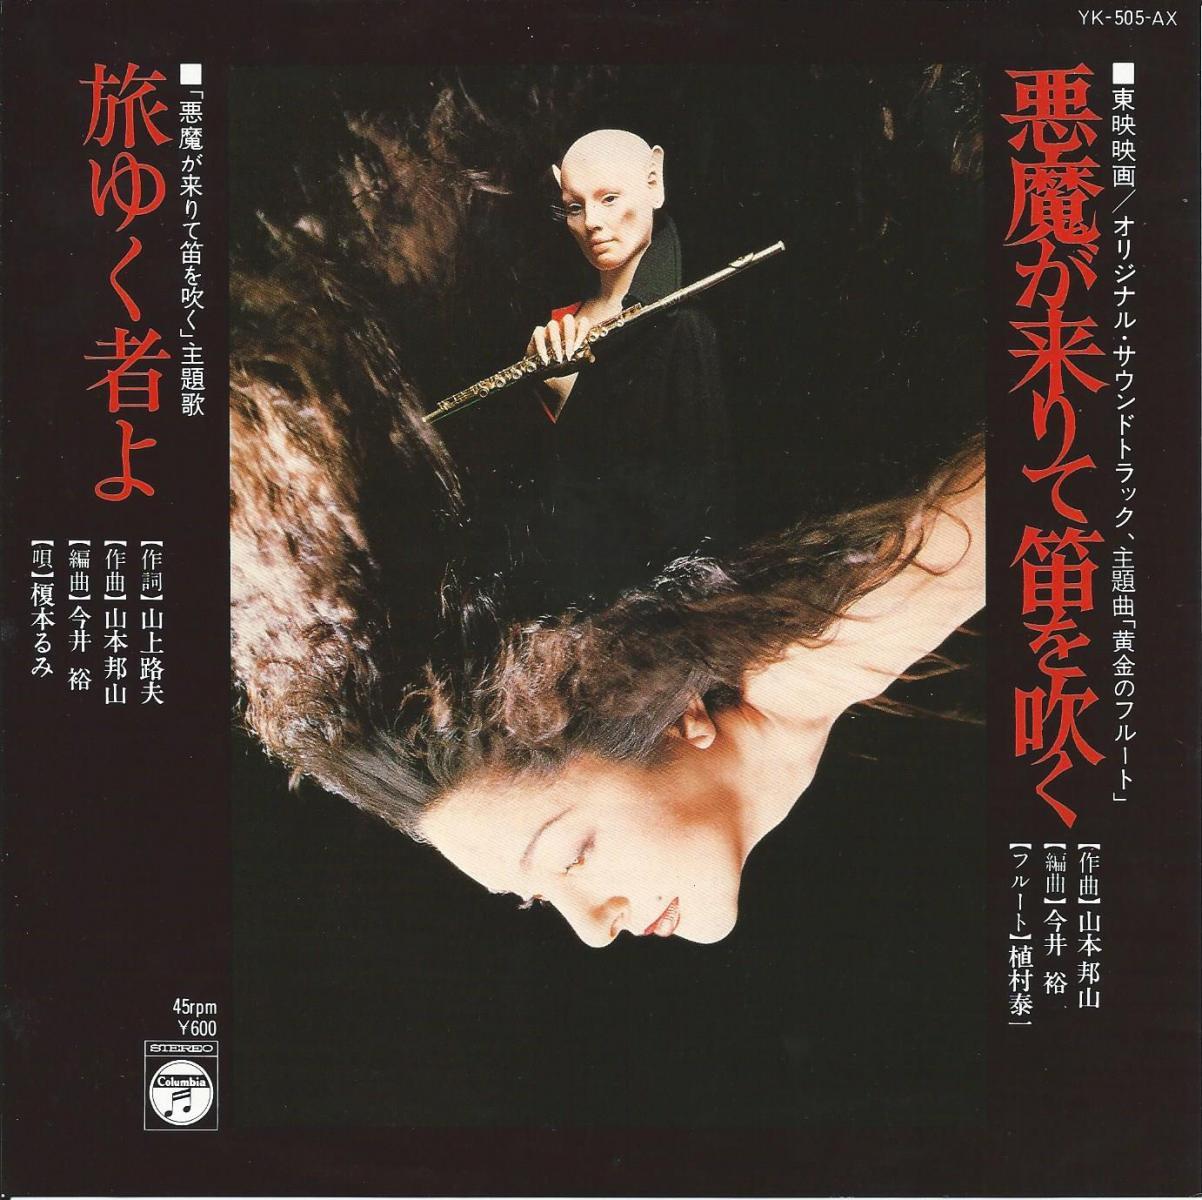 O.S.T.(山本邦山 HOZAN YAMAMOTO,今井裕 YUTAKA IMAI 植村泰一) / 悪魔が来りて笛